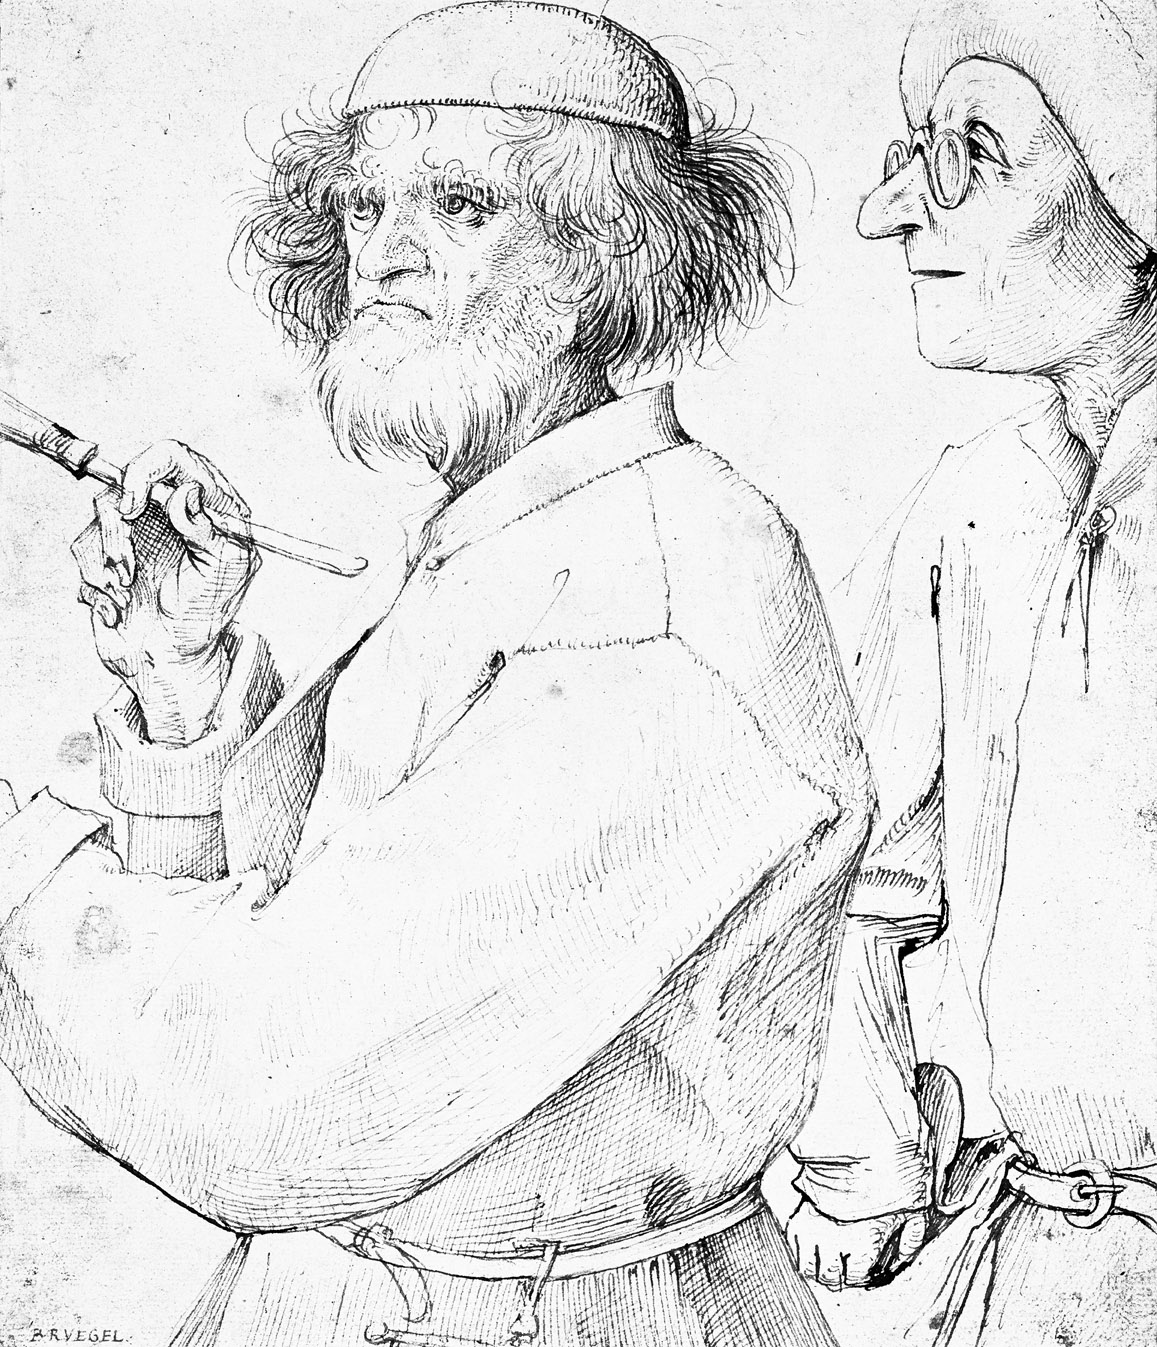 Painter and his Patron, by Pieter Brueghel the Elder, c. 1565. The Albertina, Vienna, Austria.